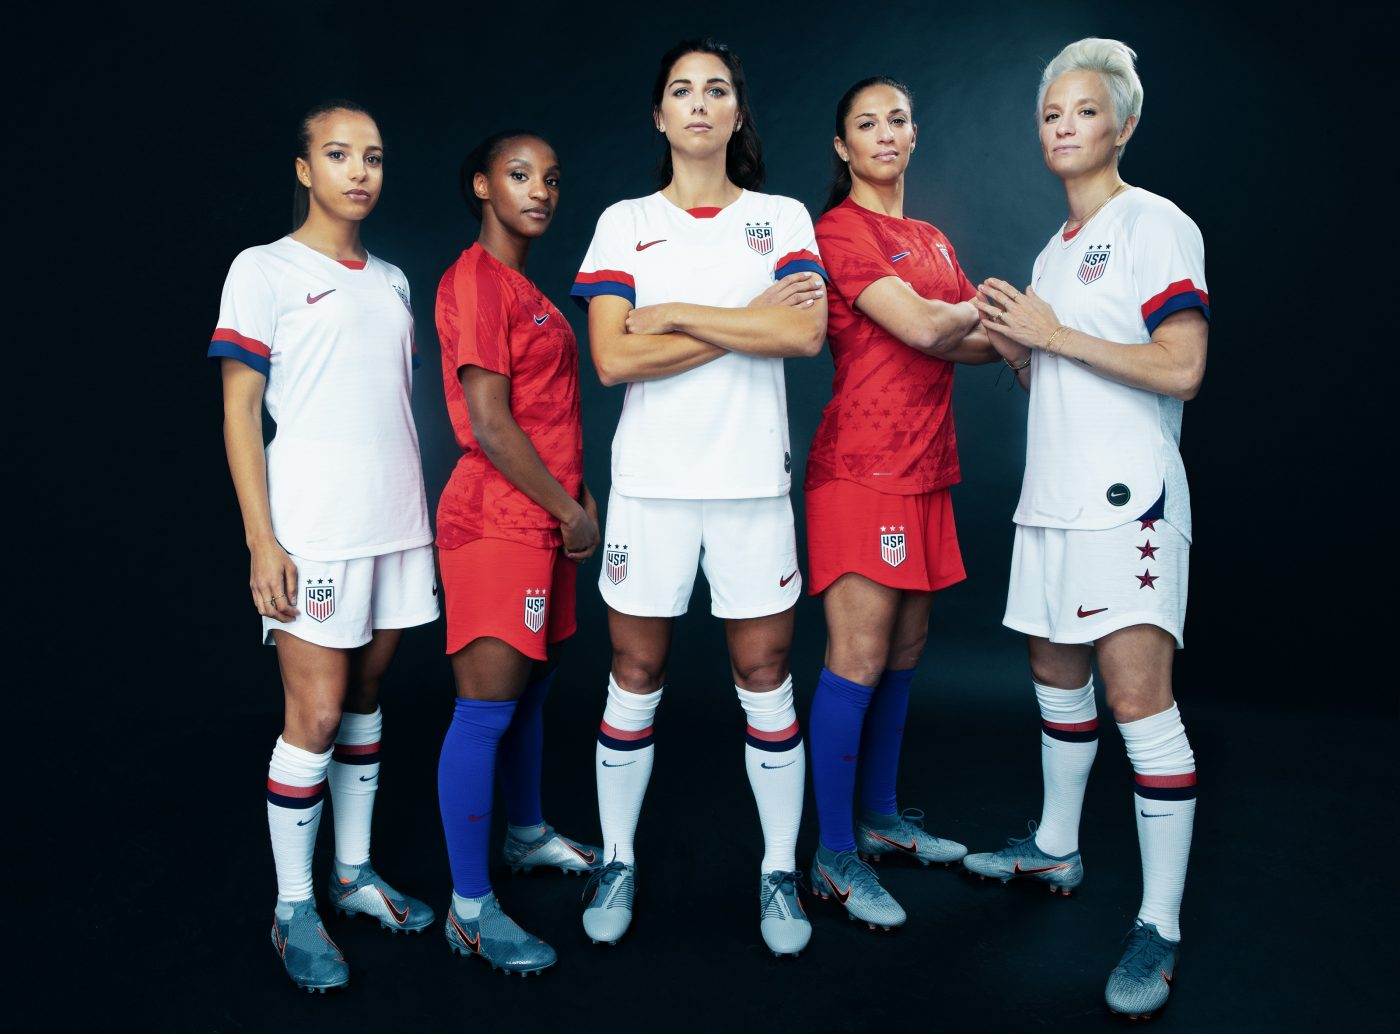 maillot-usa-etats-unis-coupe-du-monde-feminine-2019-nike